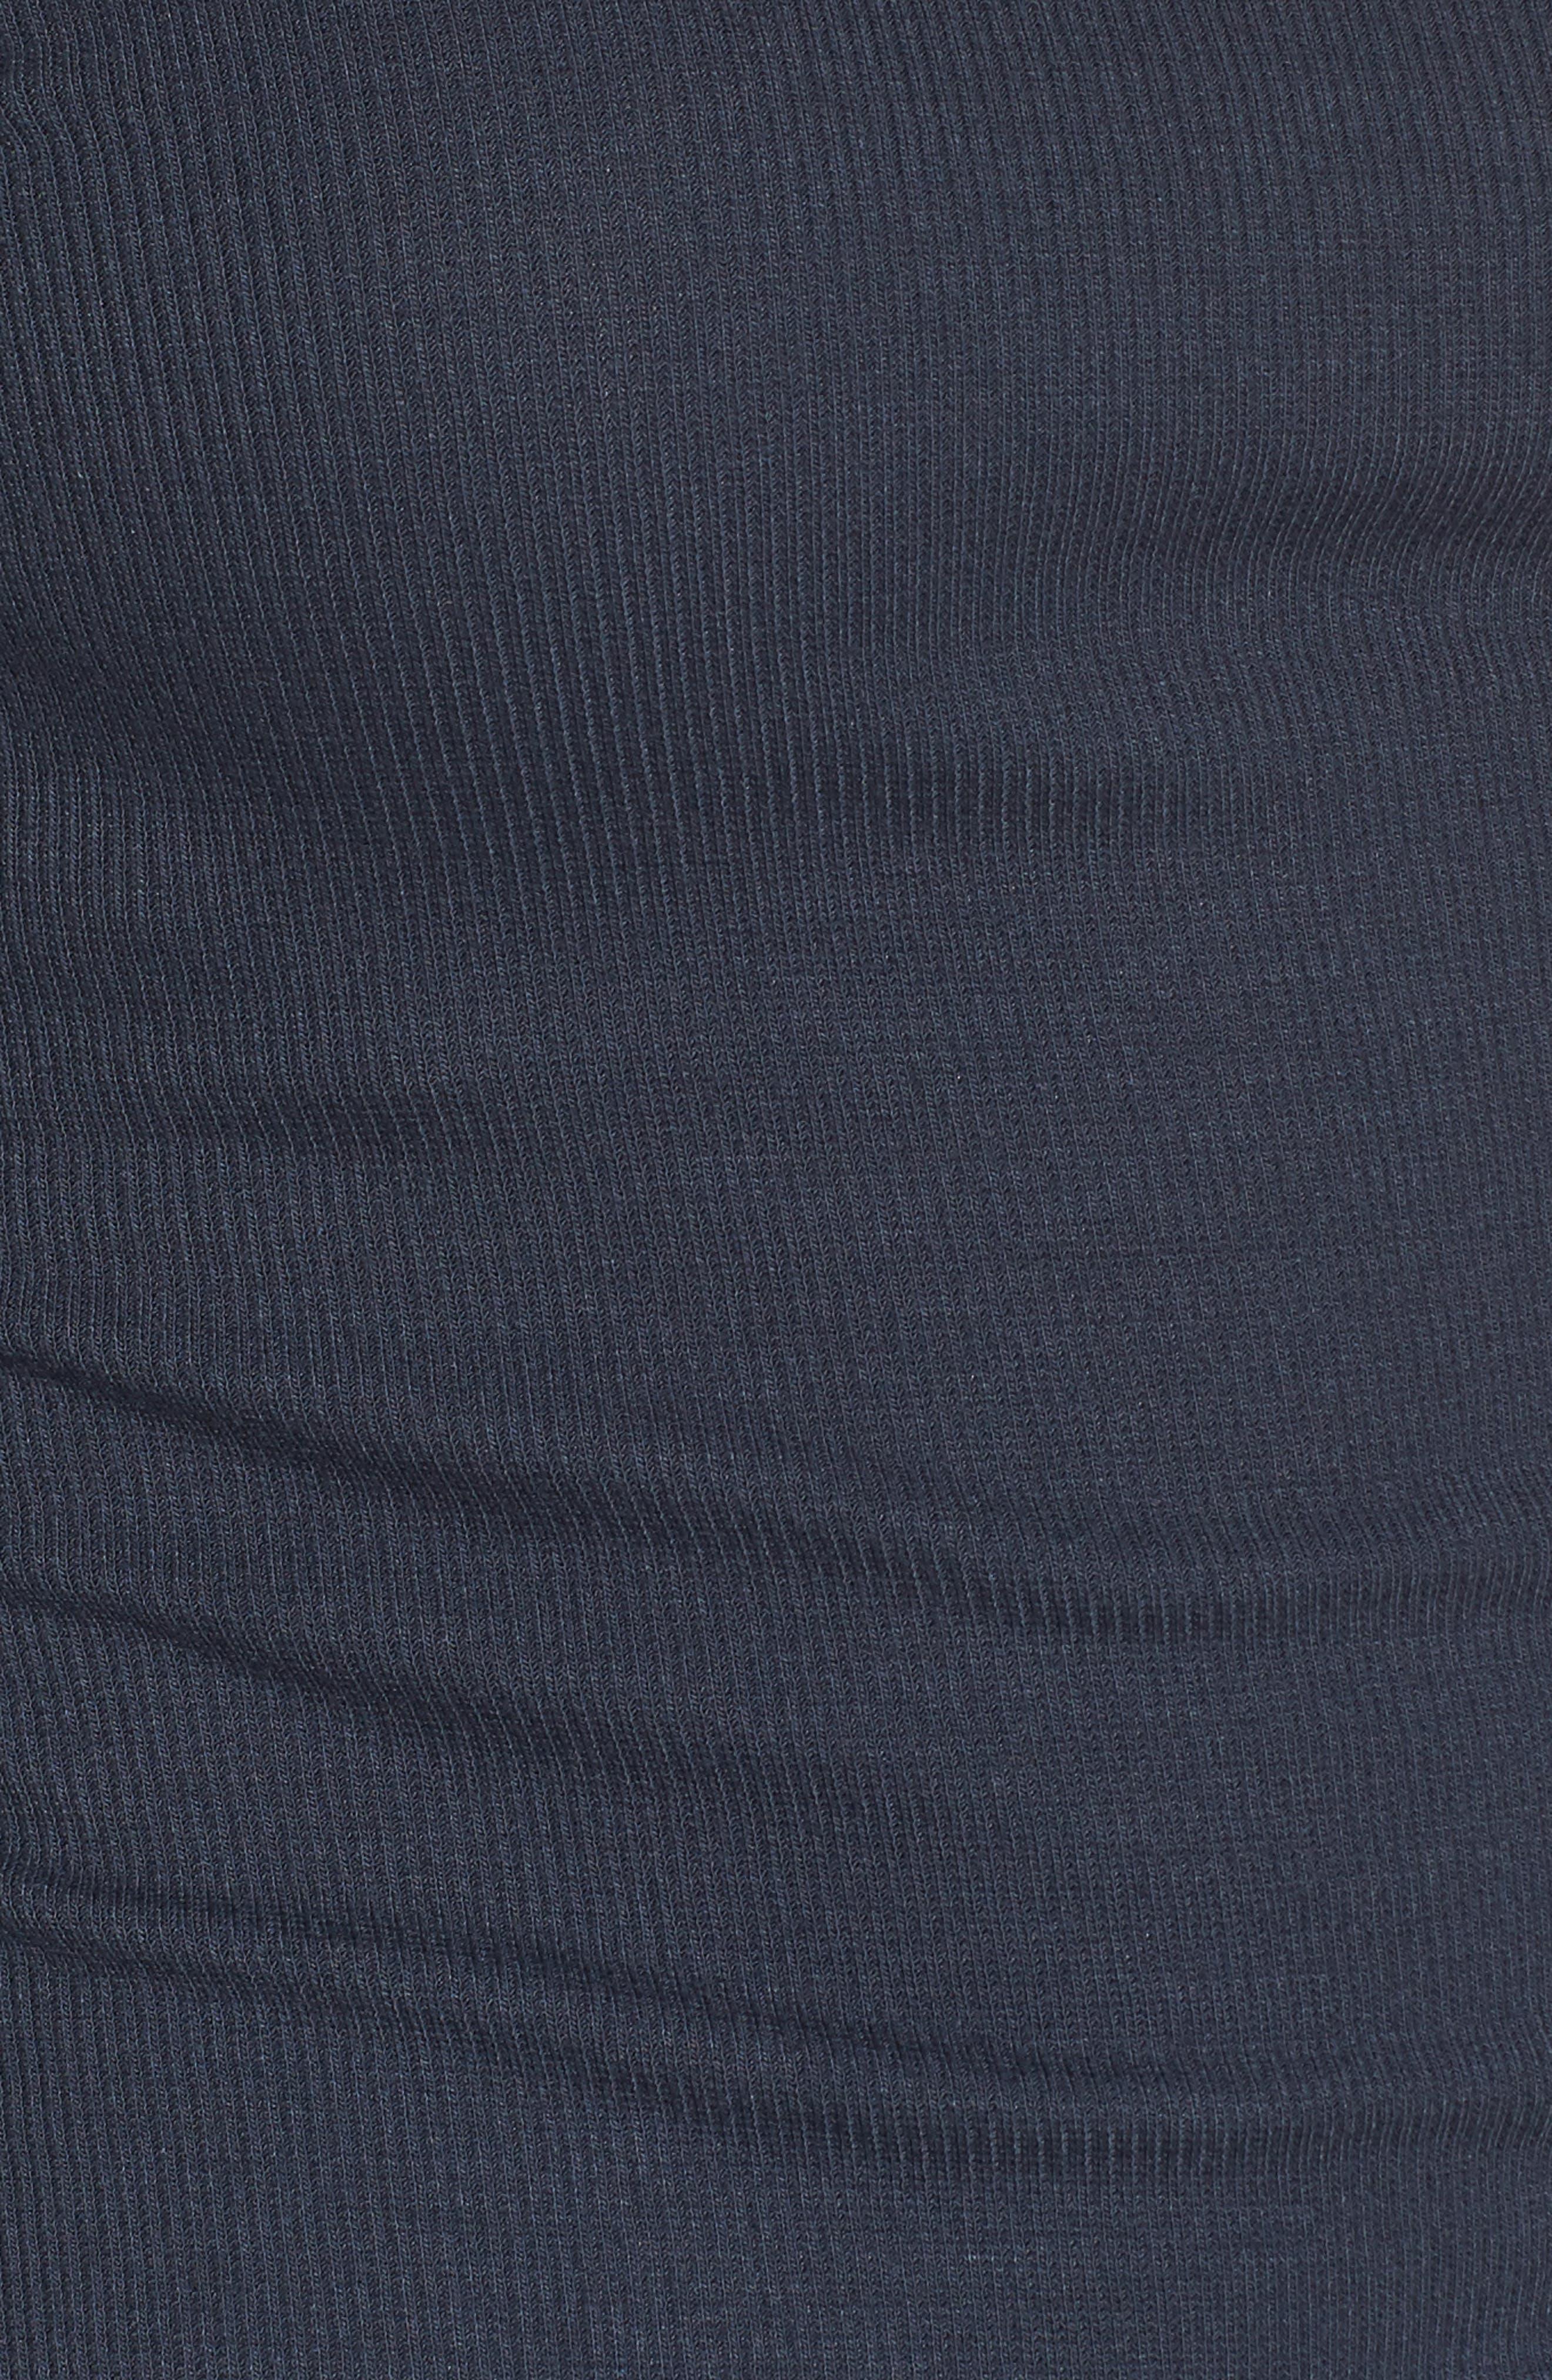 Alternate Image 5  - Hinge Long Sleeve Ruffle Tee